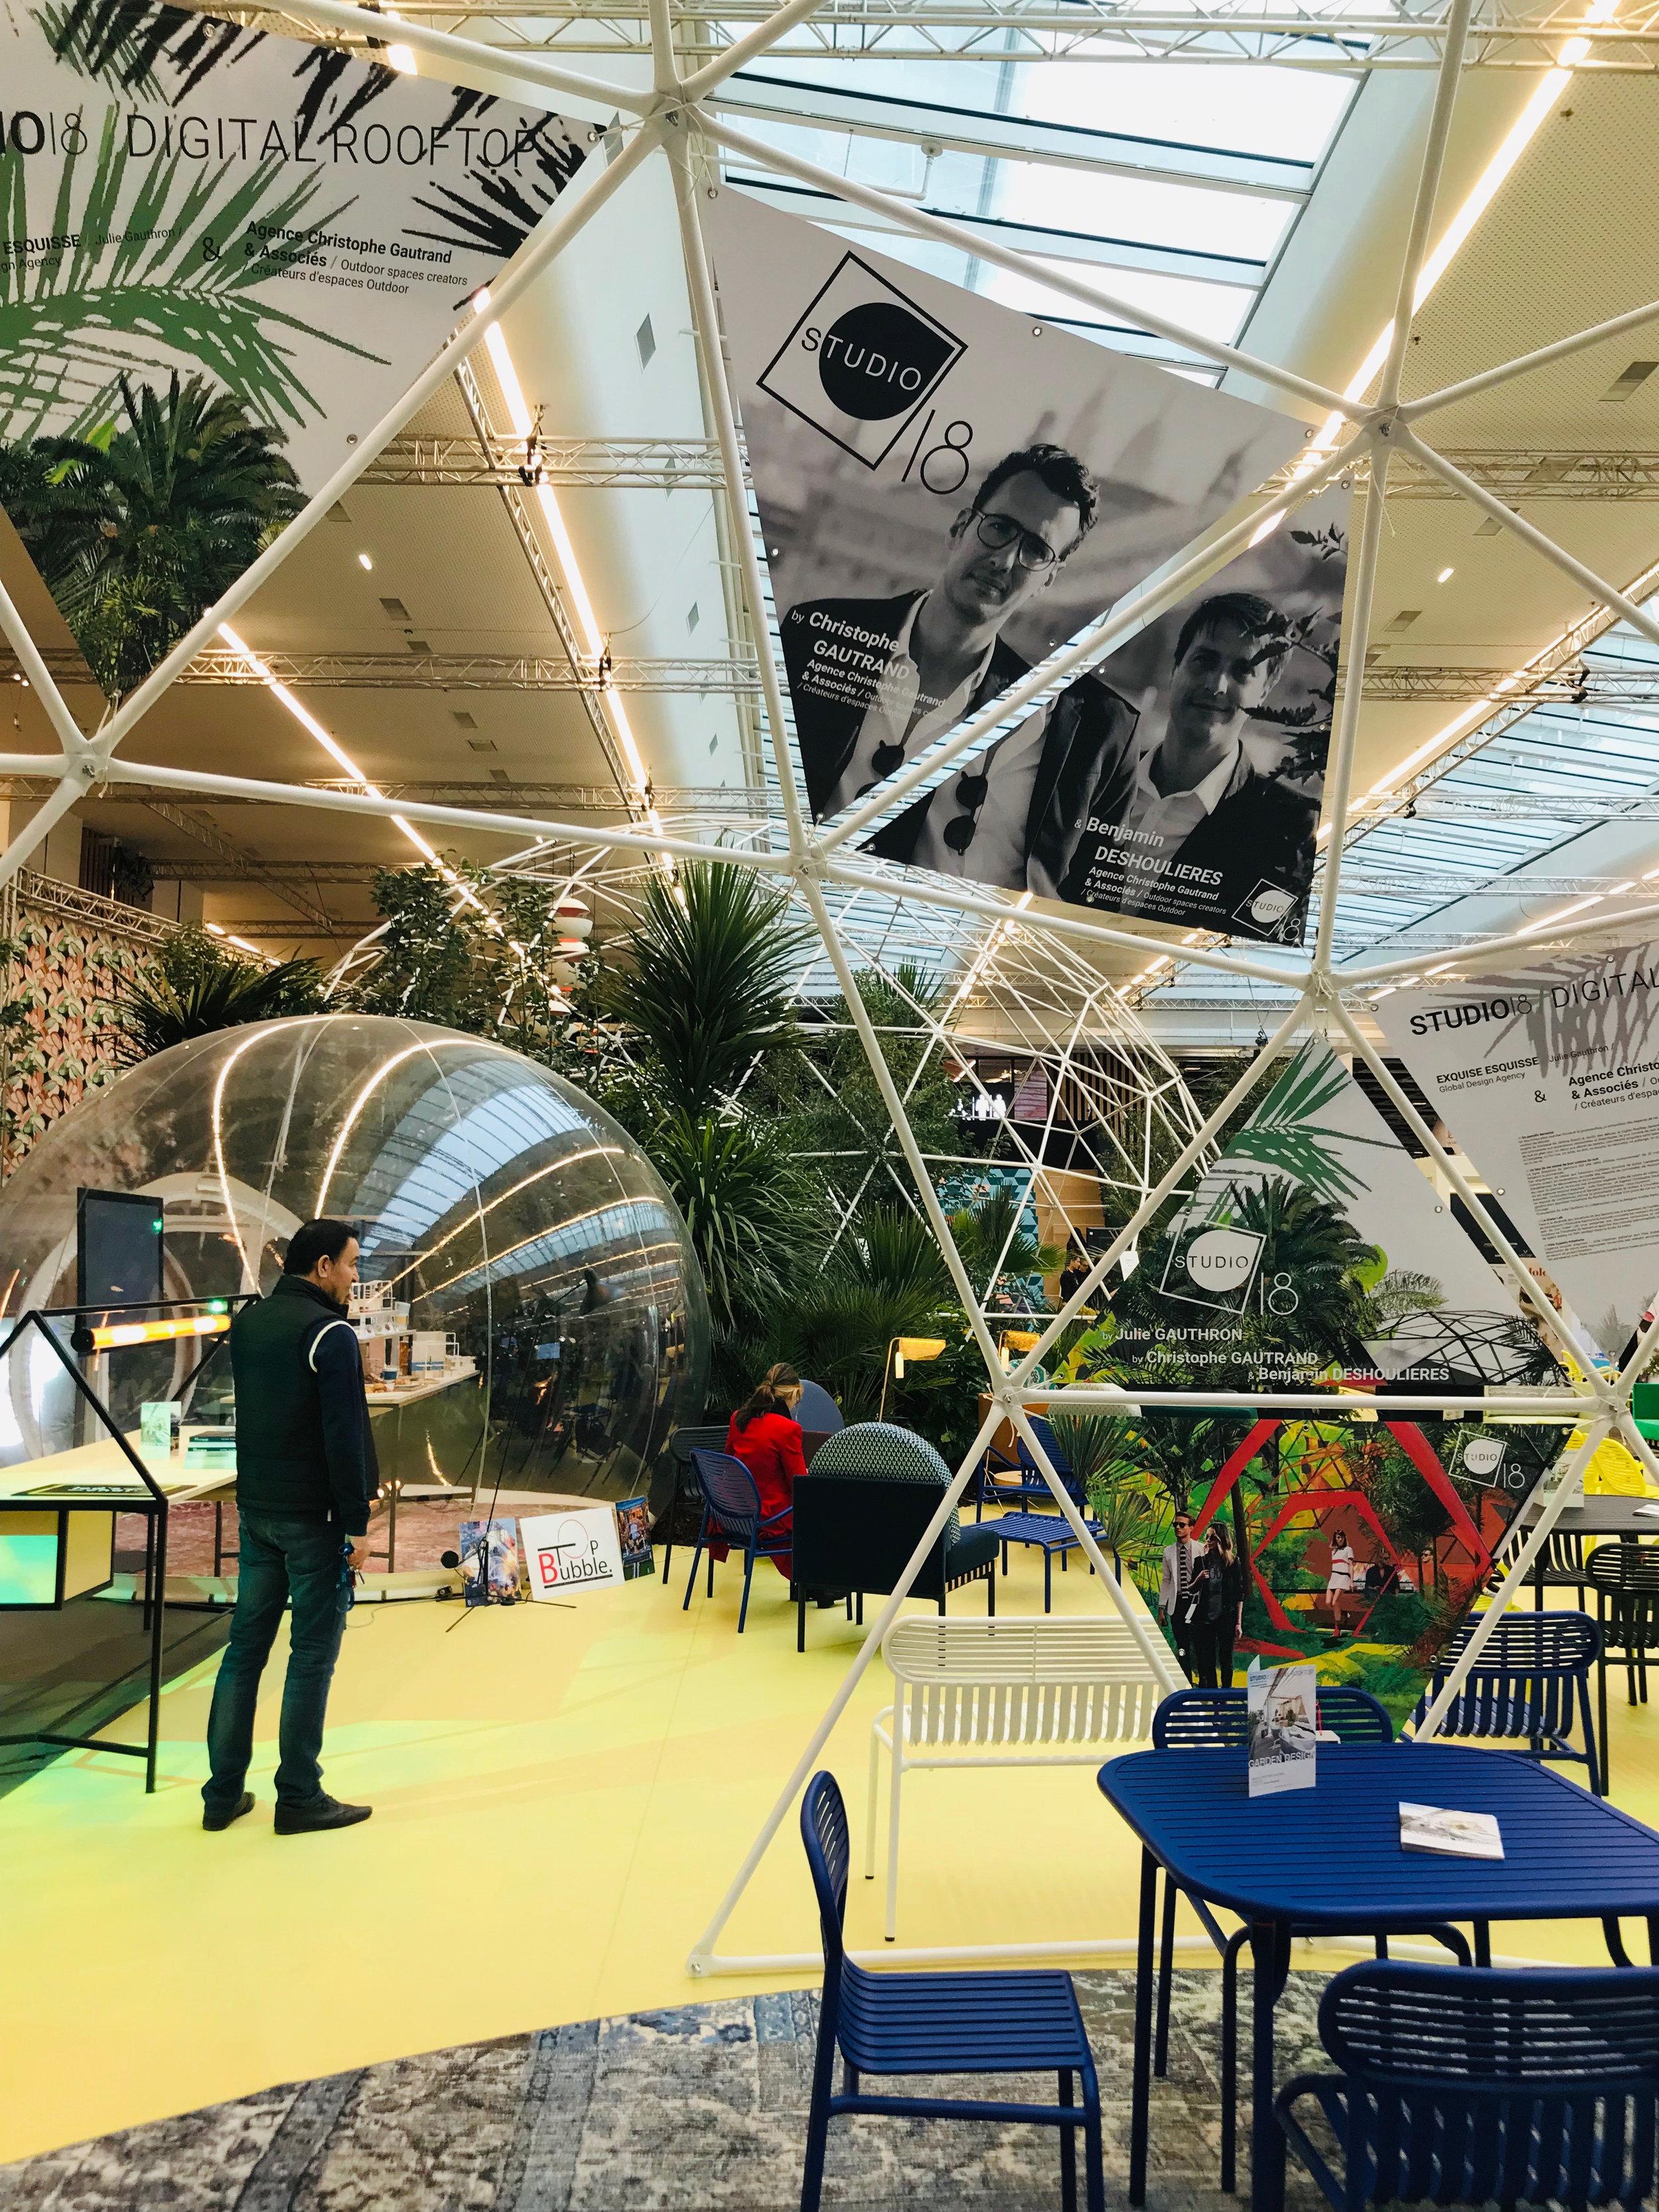 equiphotel_tradeshow_paris_terraces_gardens_outdoor_design_christophe_gautrand_landscape_14.jpg